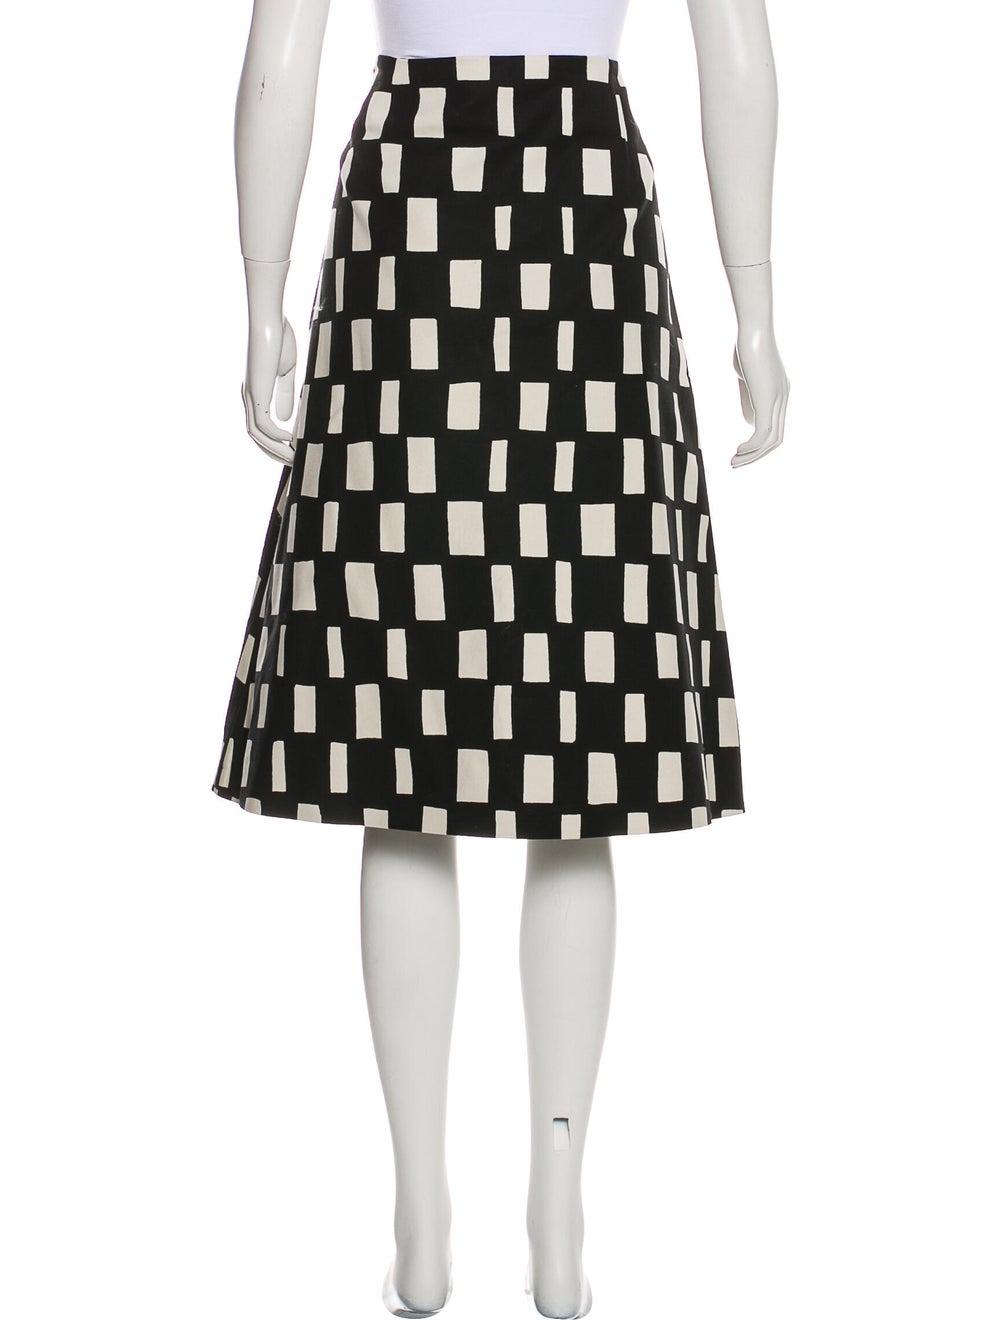 Marimekko Patterned Knee-Length Skirt Black - image 3